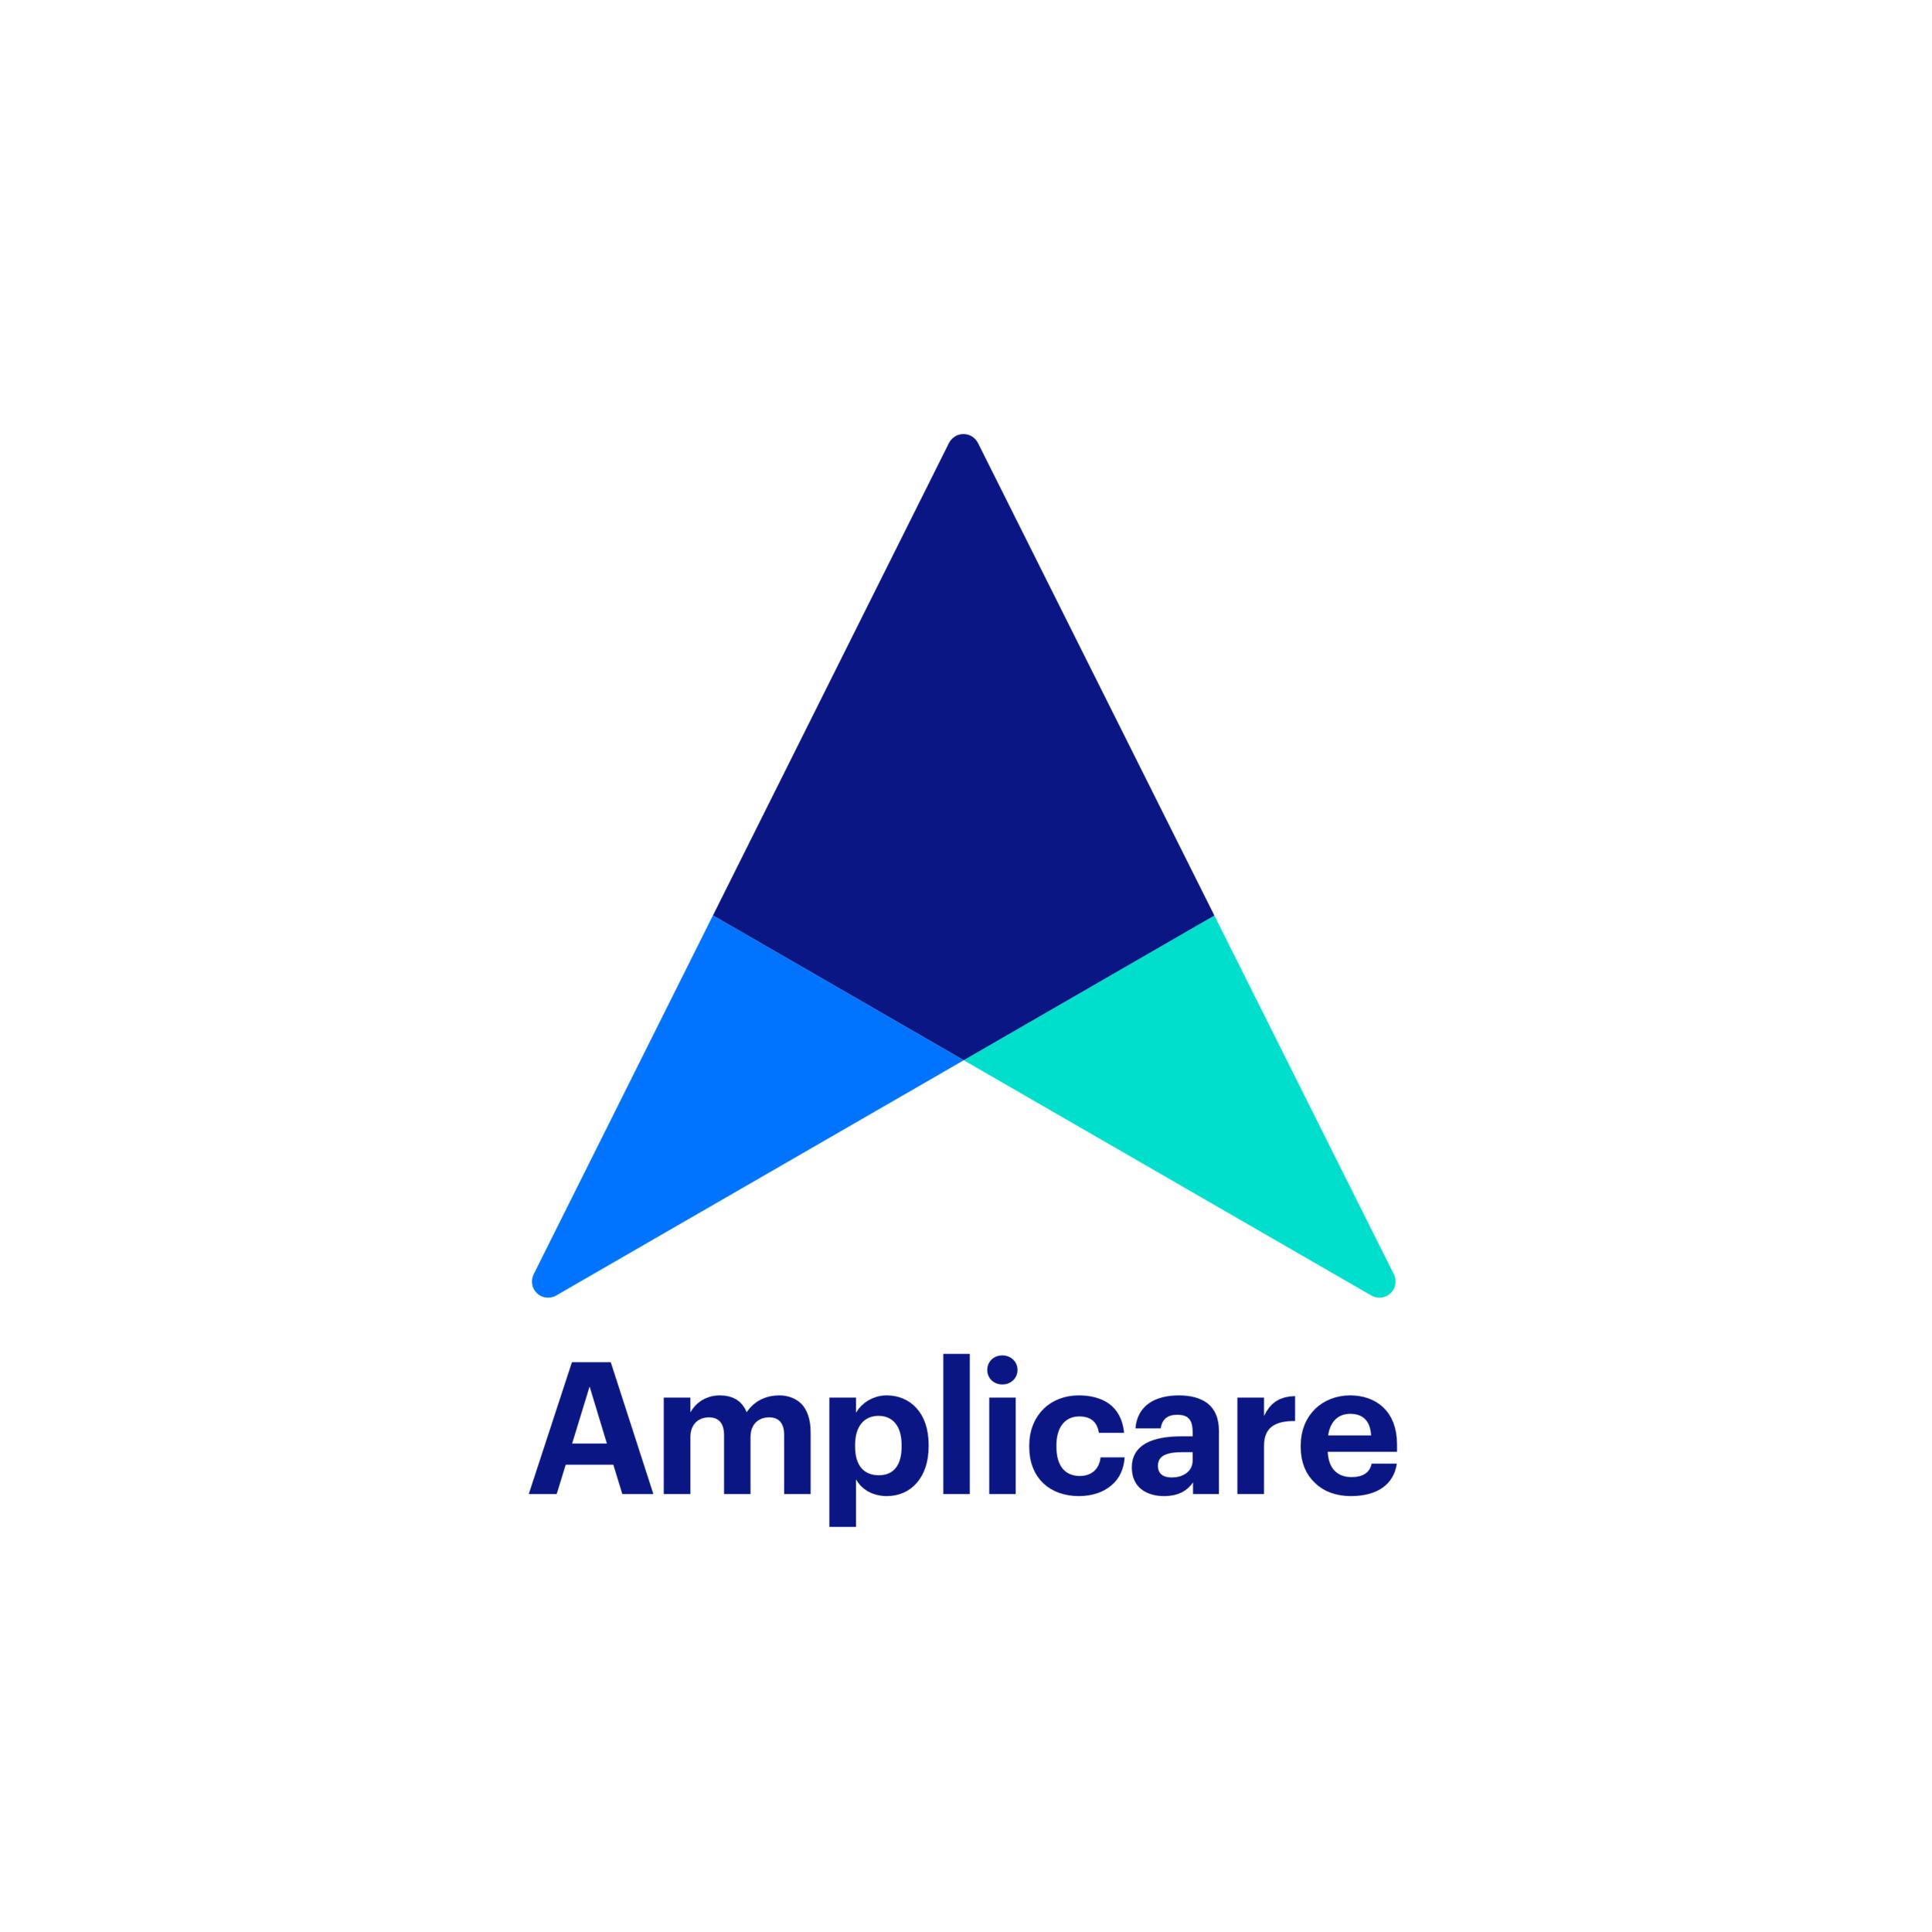 Logo Amplicare@2x.png